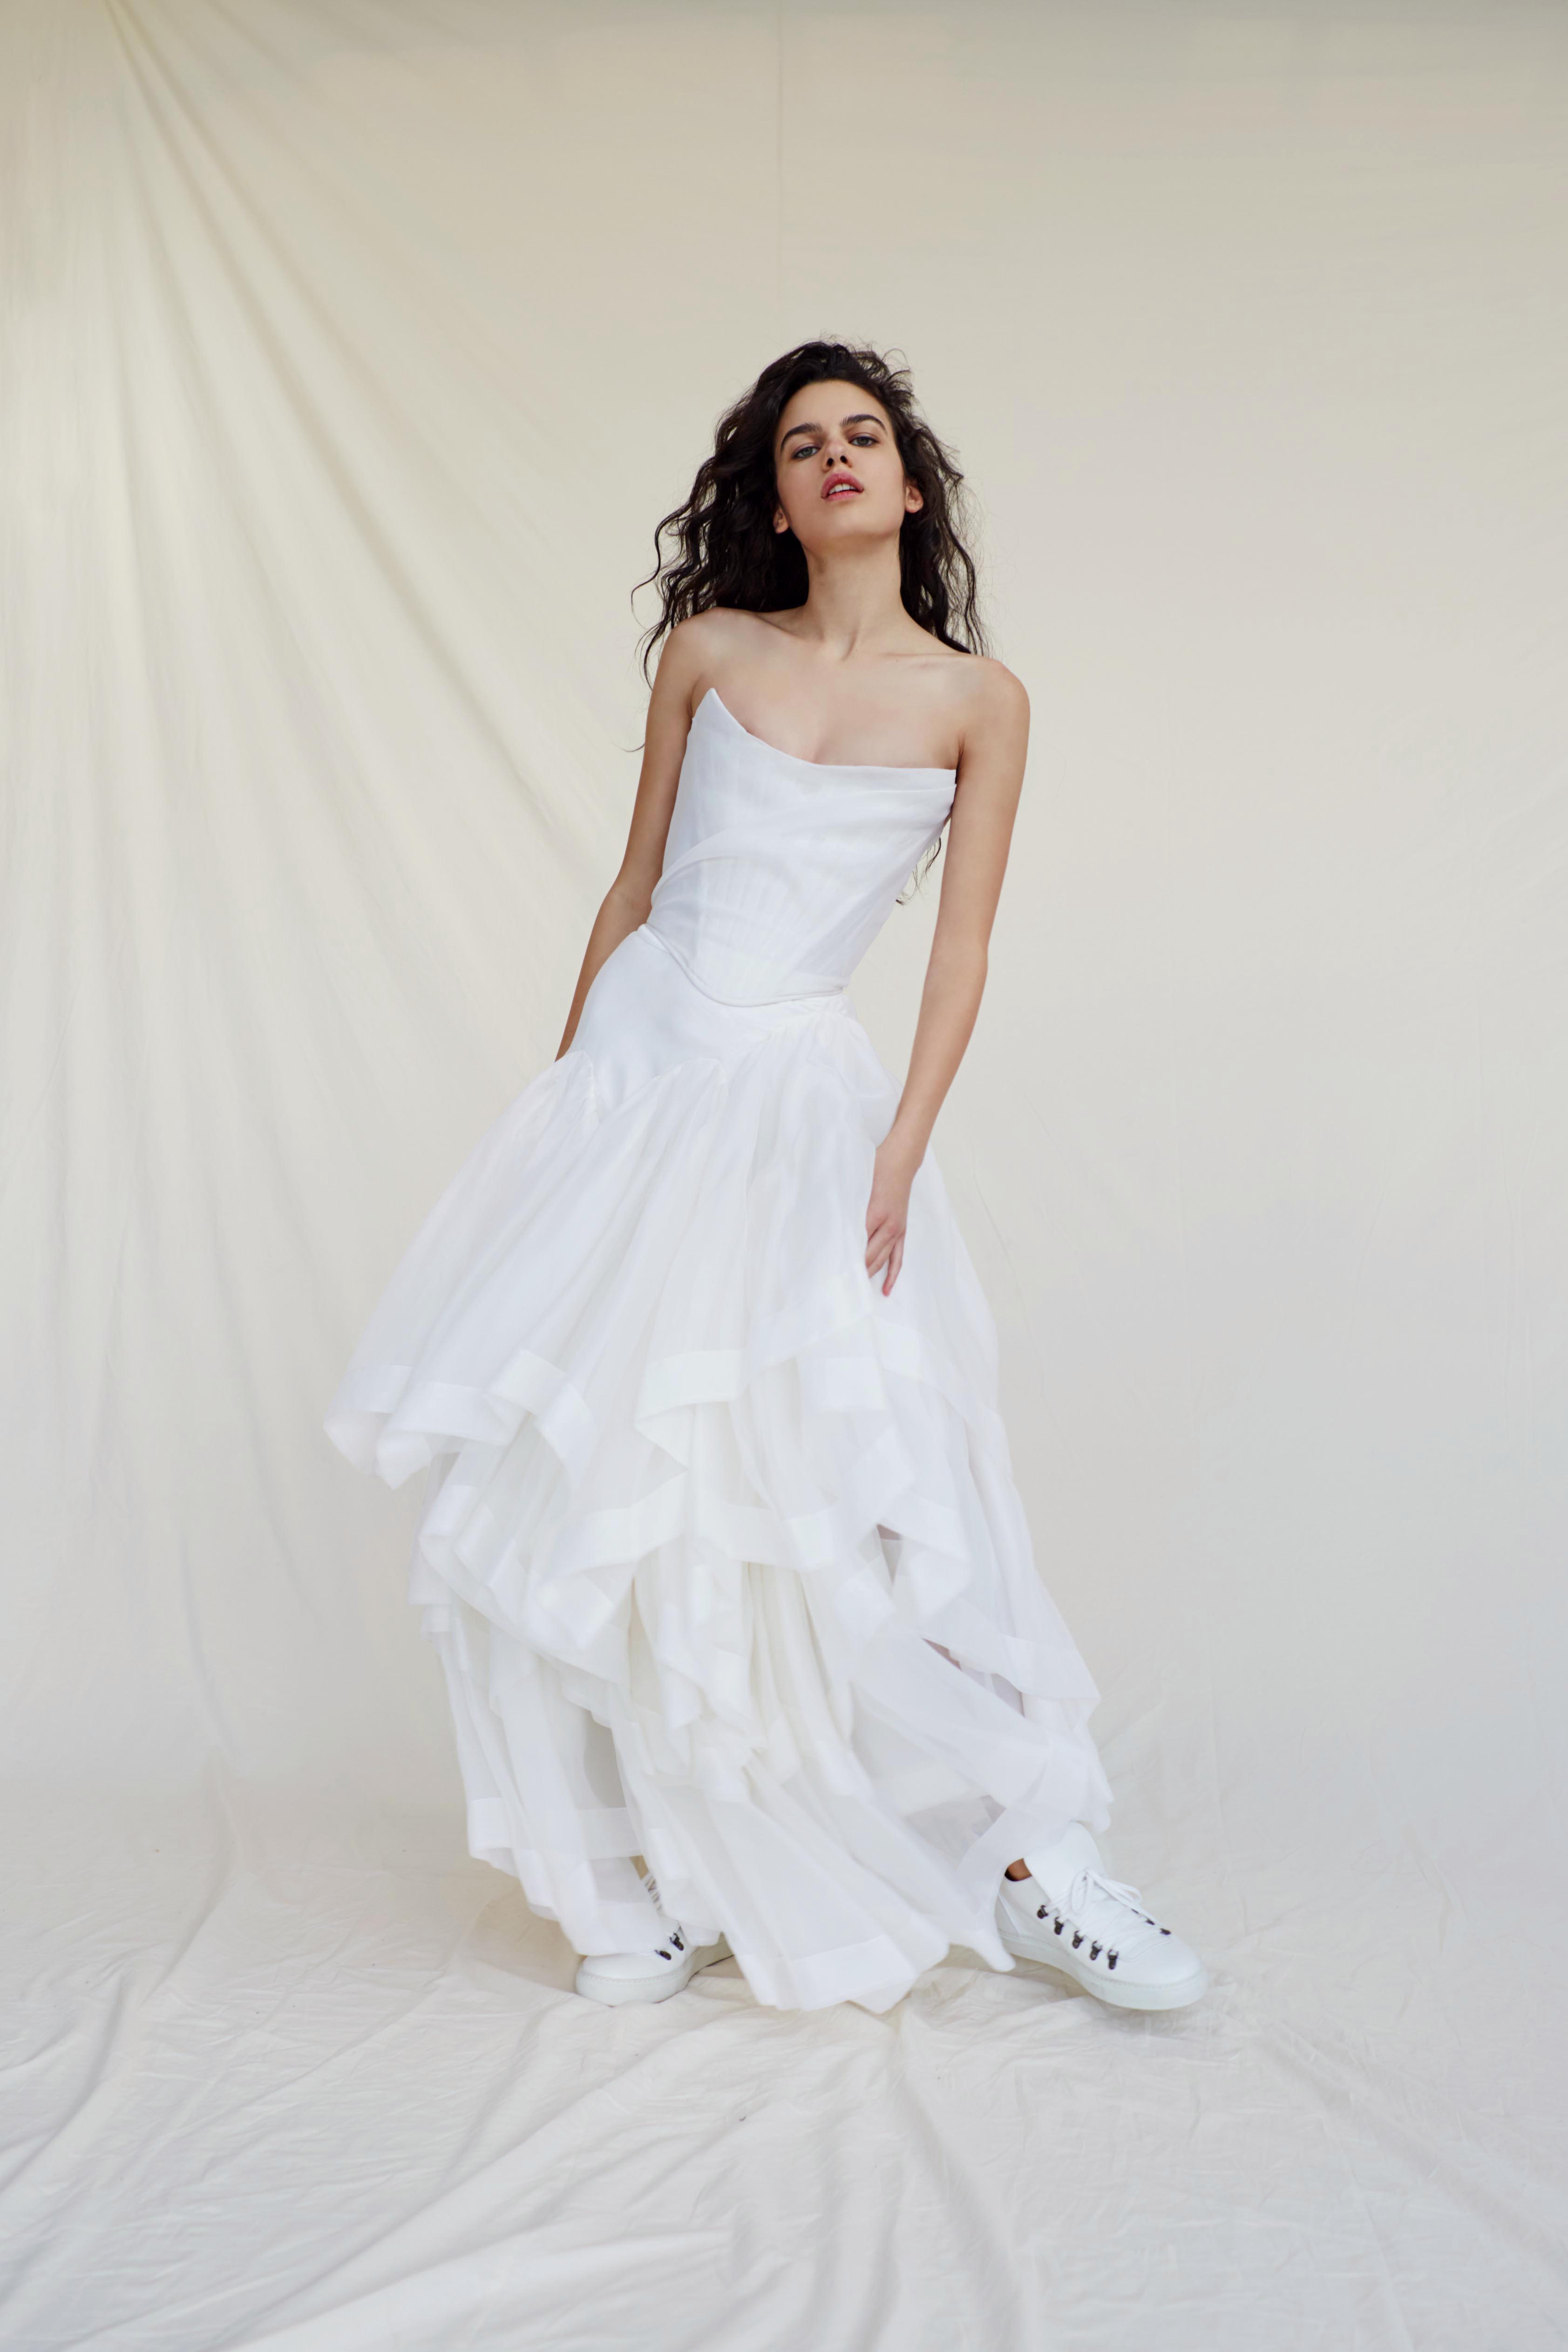 vivienne westwood wedding dress Spring 2019 strapless corset top a-line